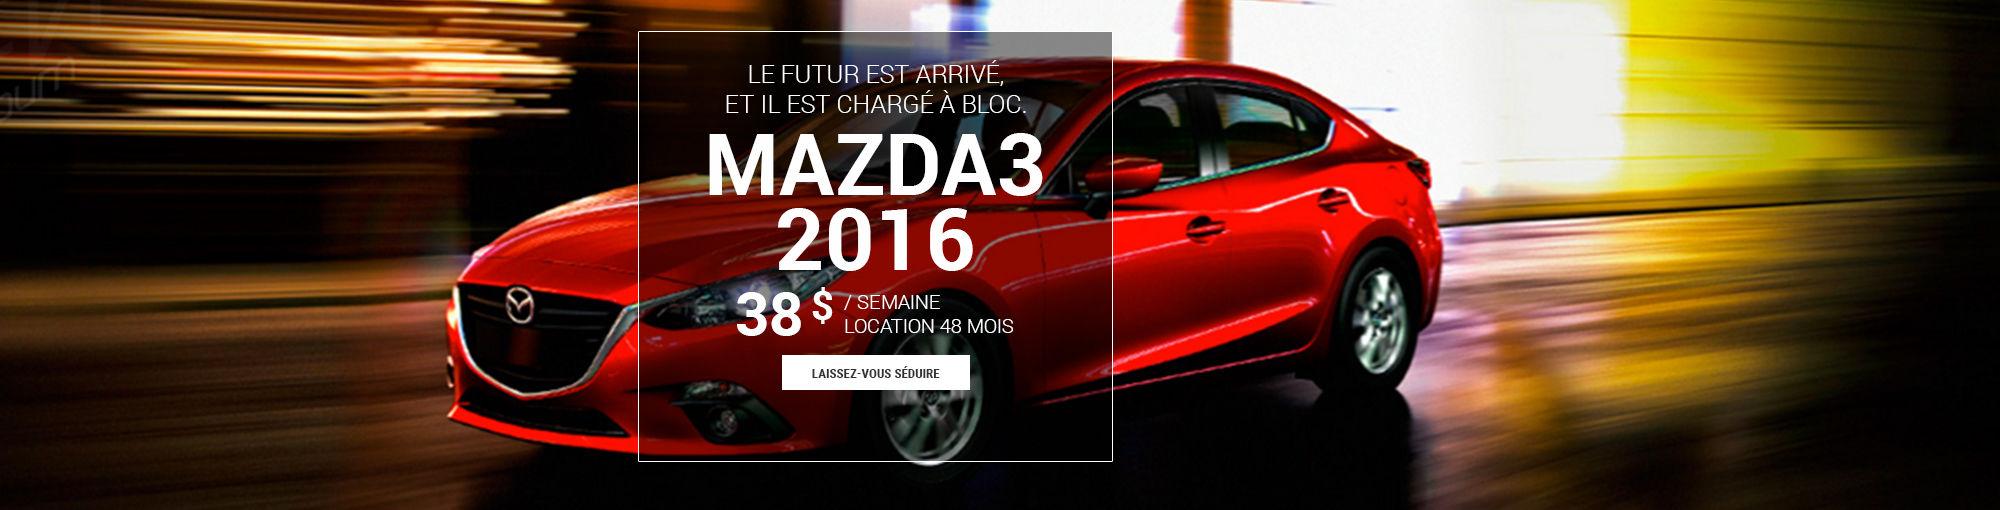 Mazda3 2016 - octobre 2016